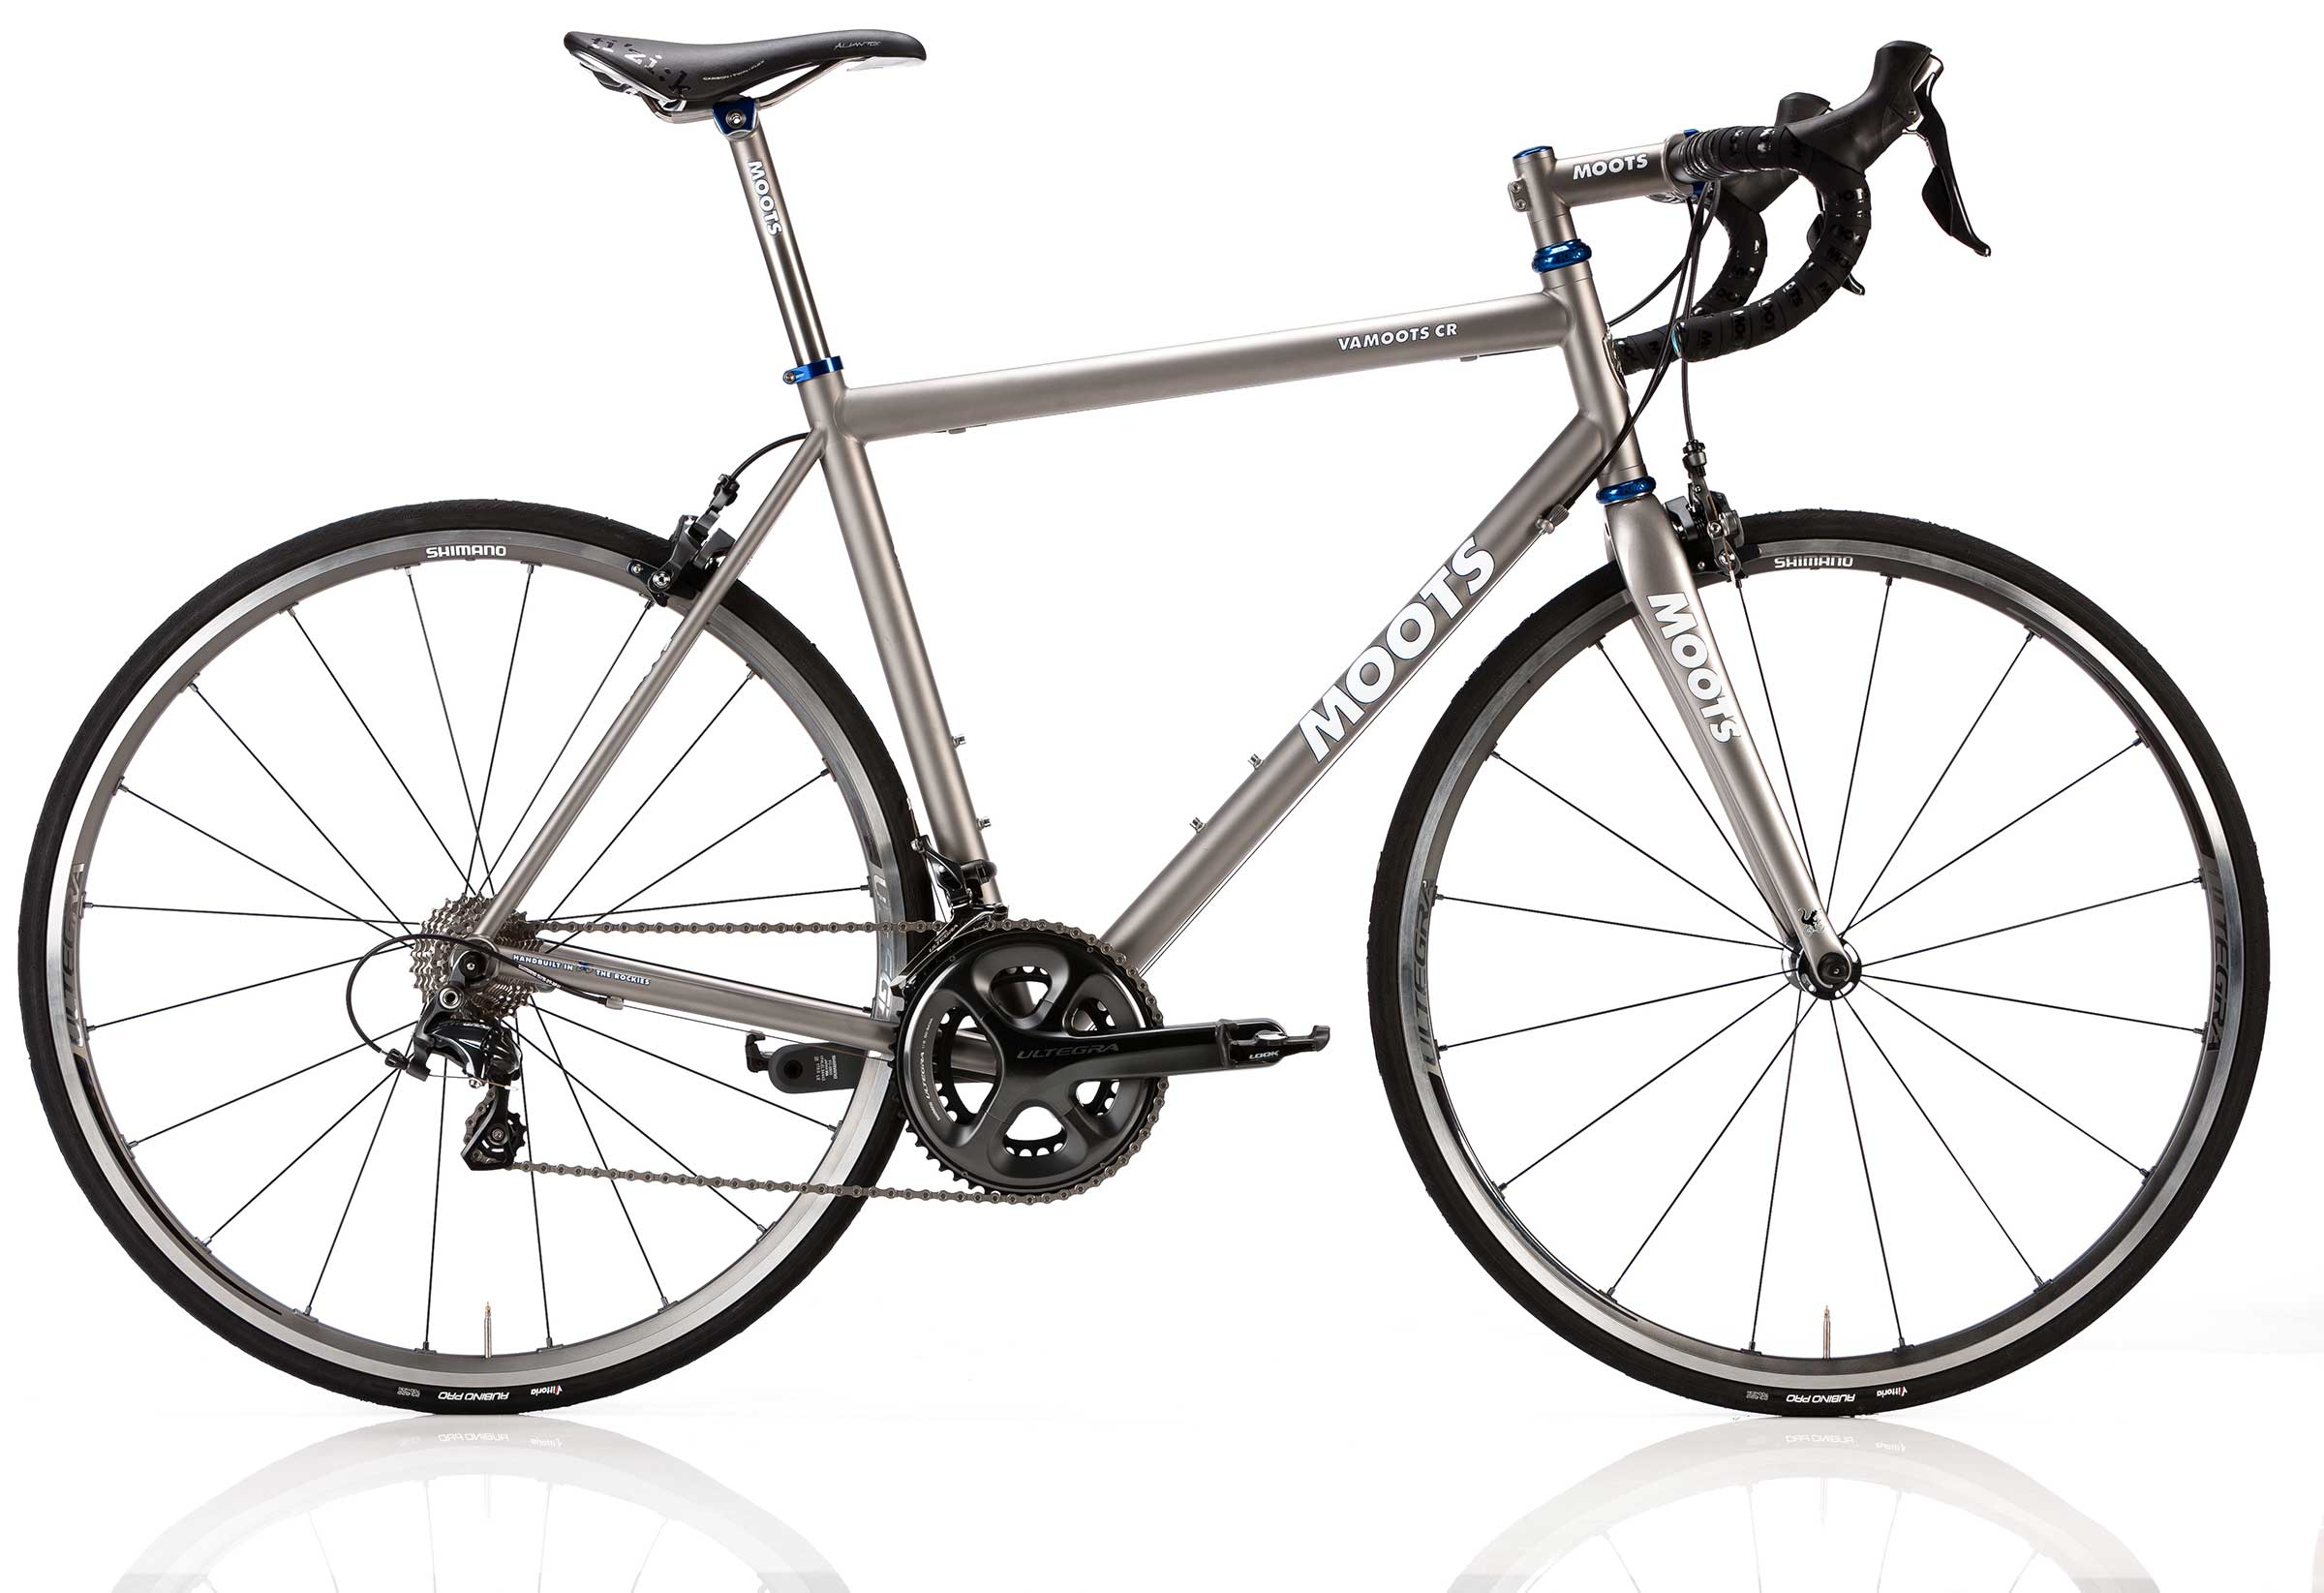 moots vamoots cr frame - the bike way